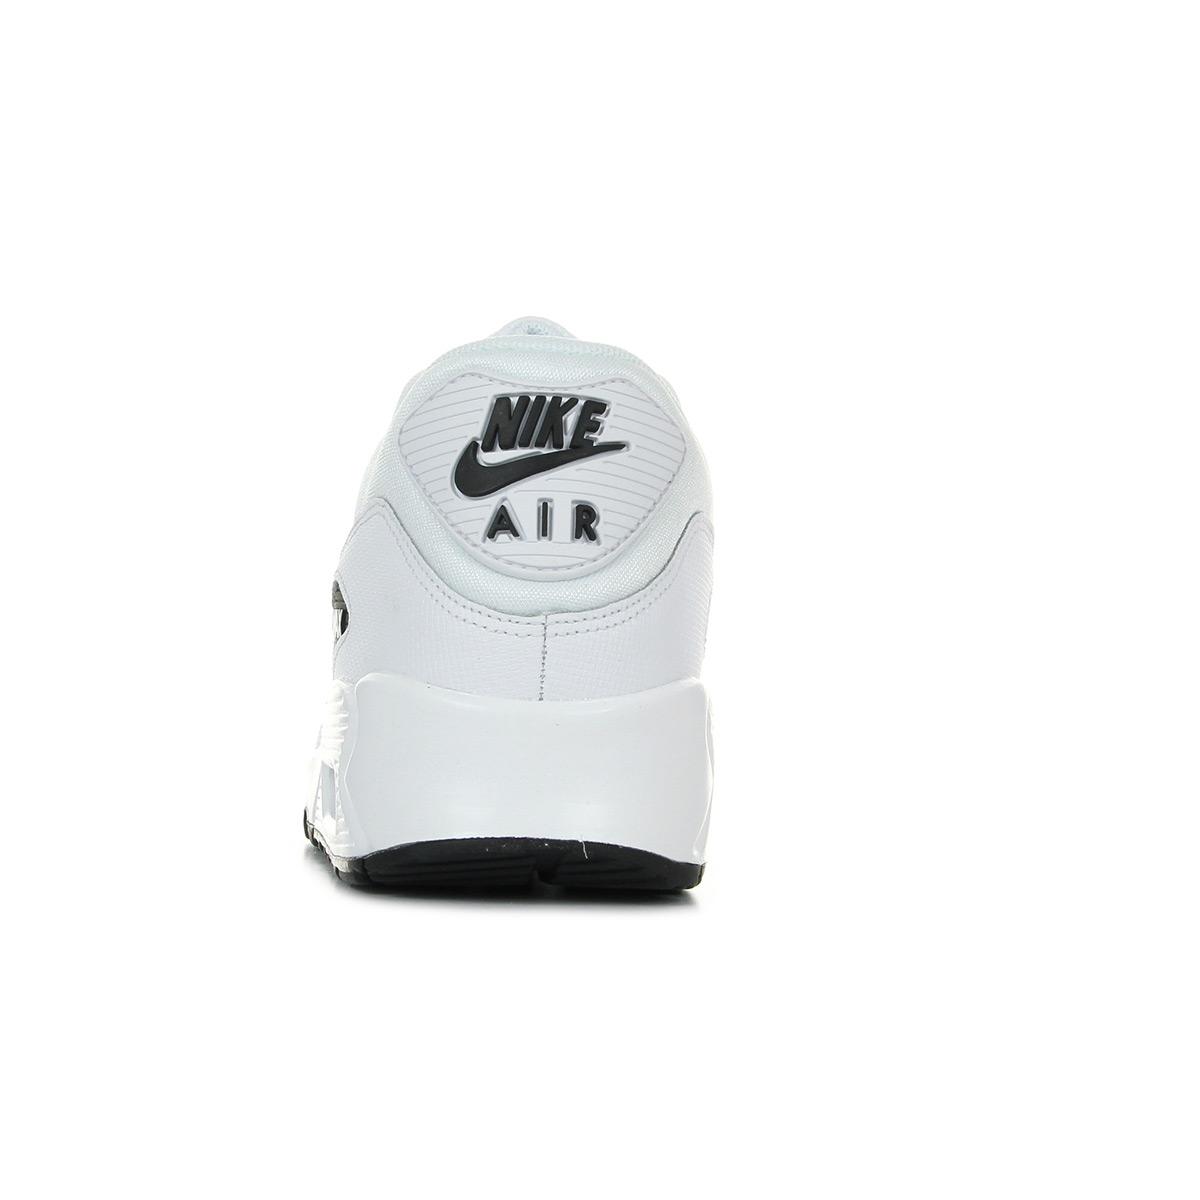 Nike WMNS Air Max 90 325213131, Baskets mode femme